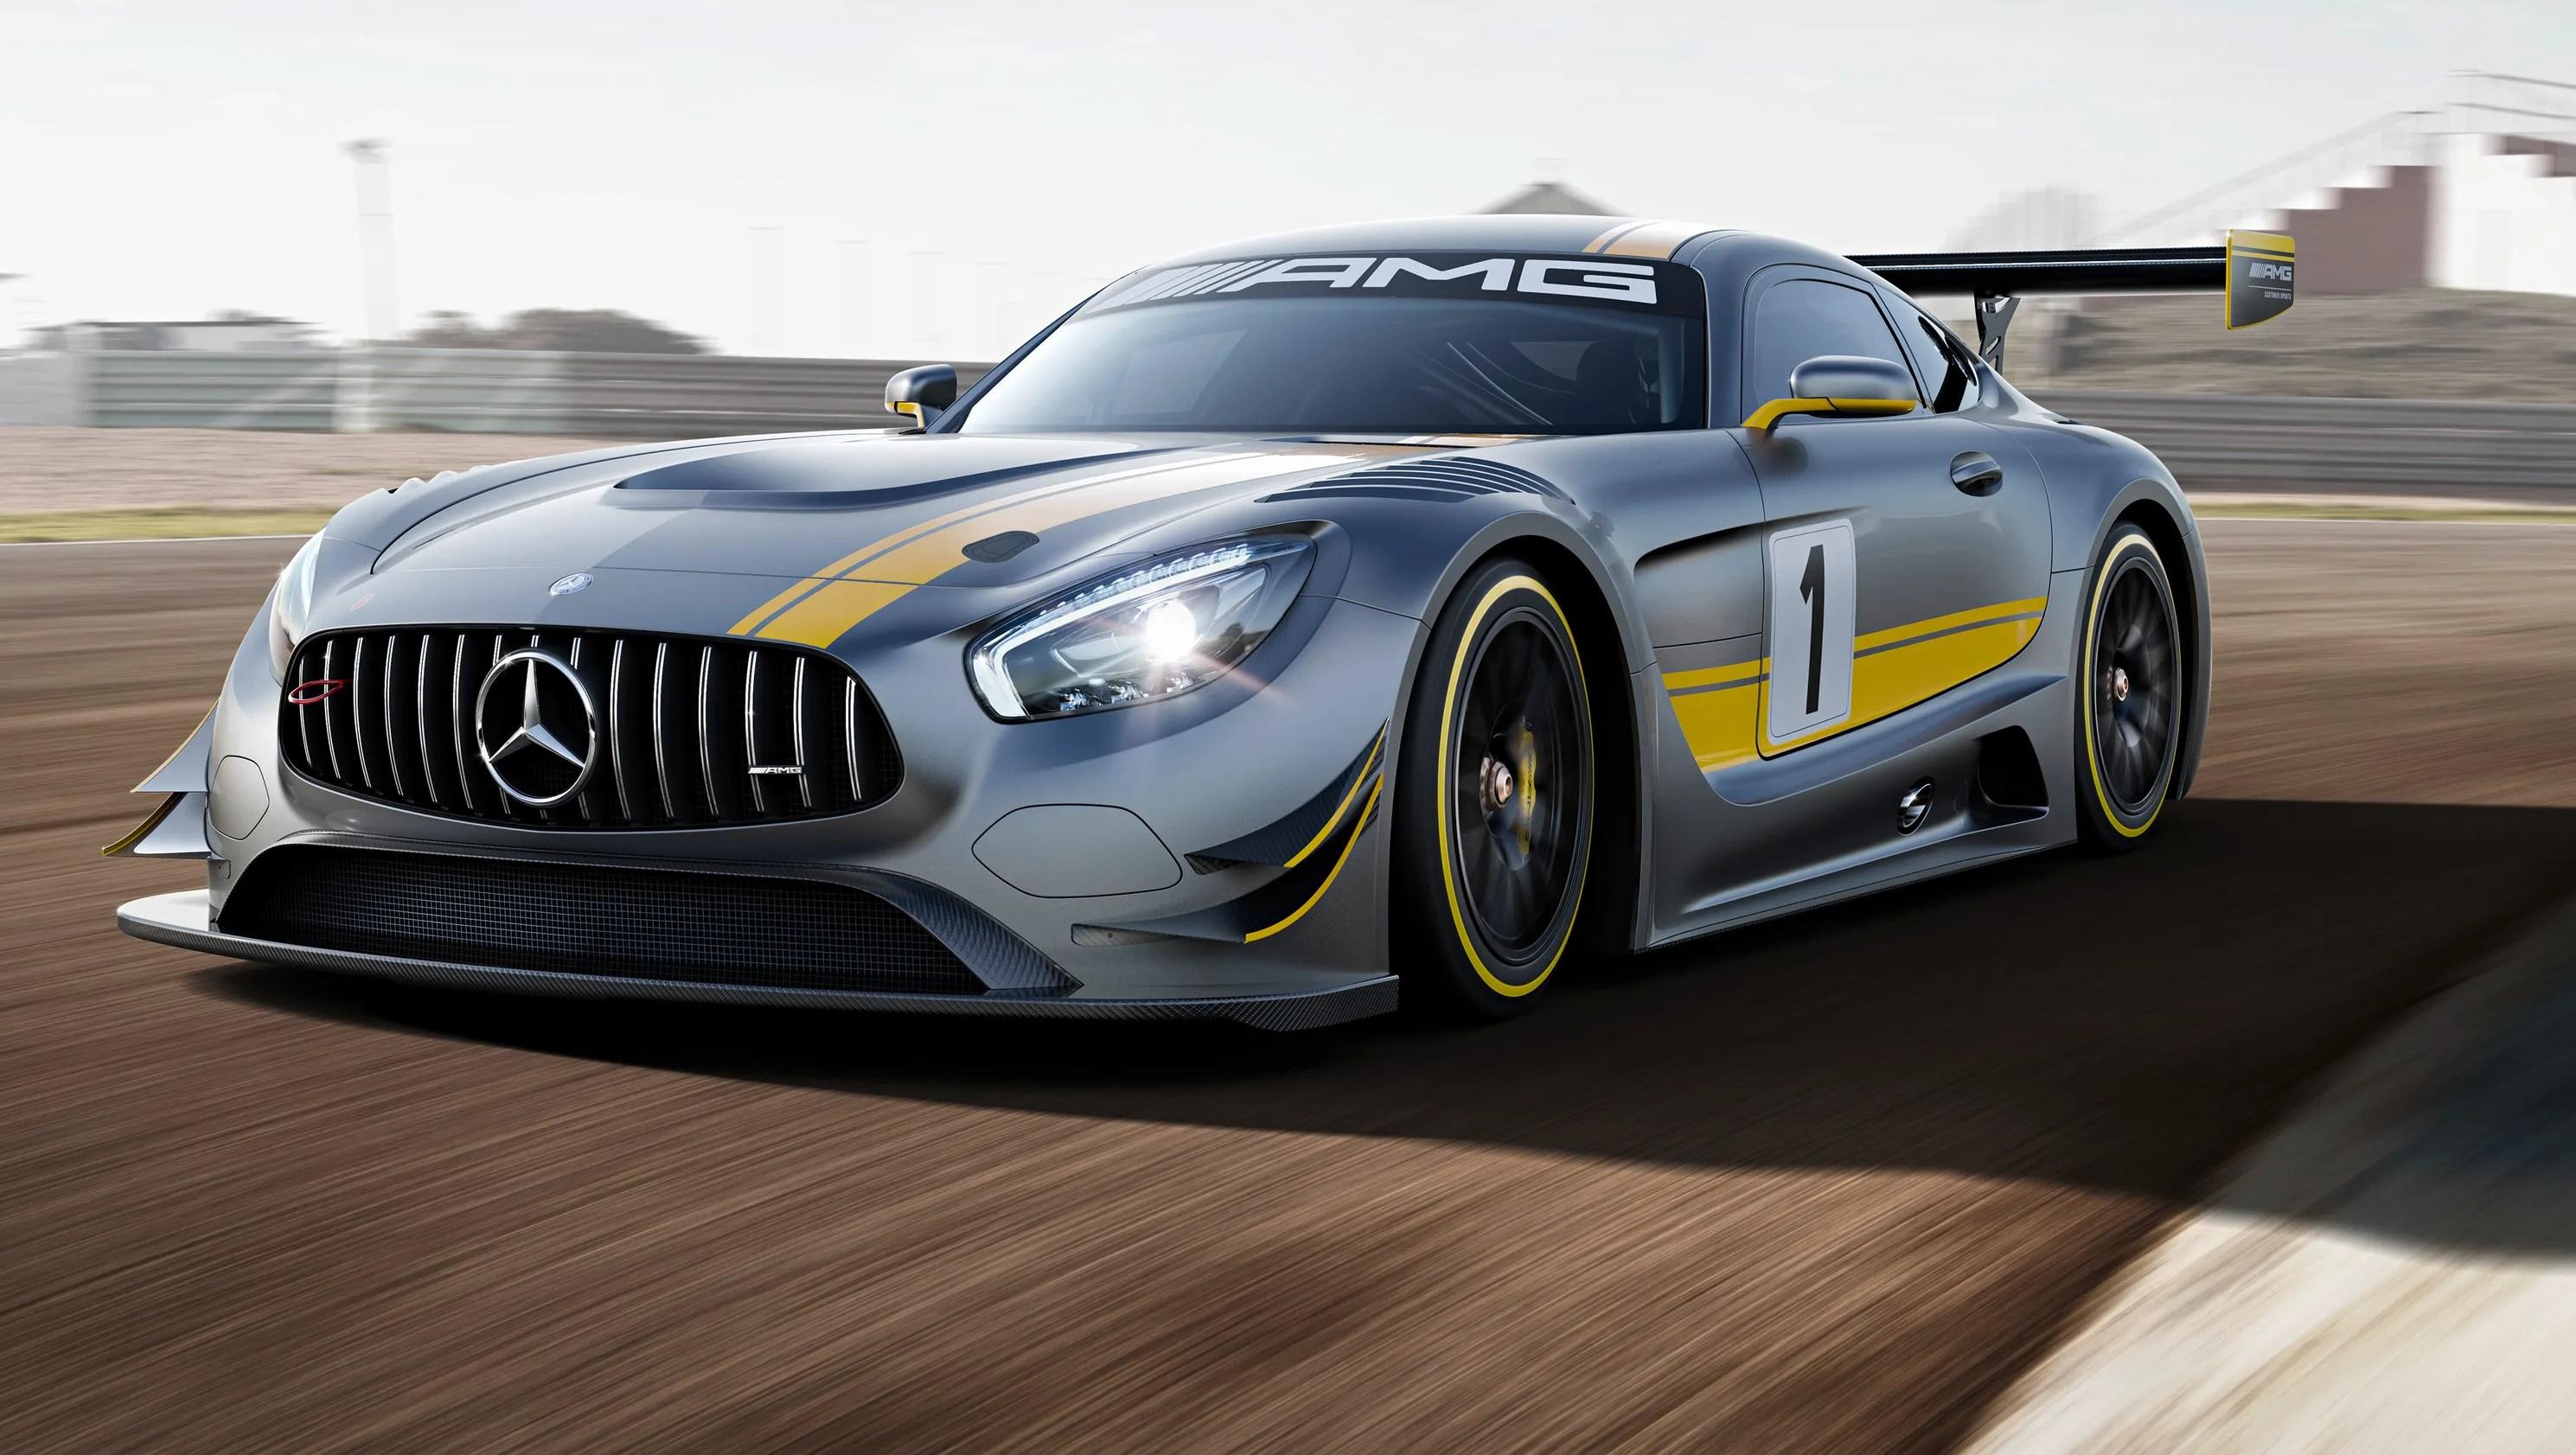 Mercedes AMG Creates Racing Version Of GT Supercar